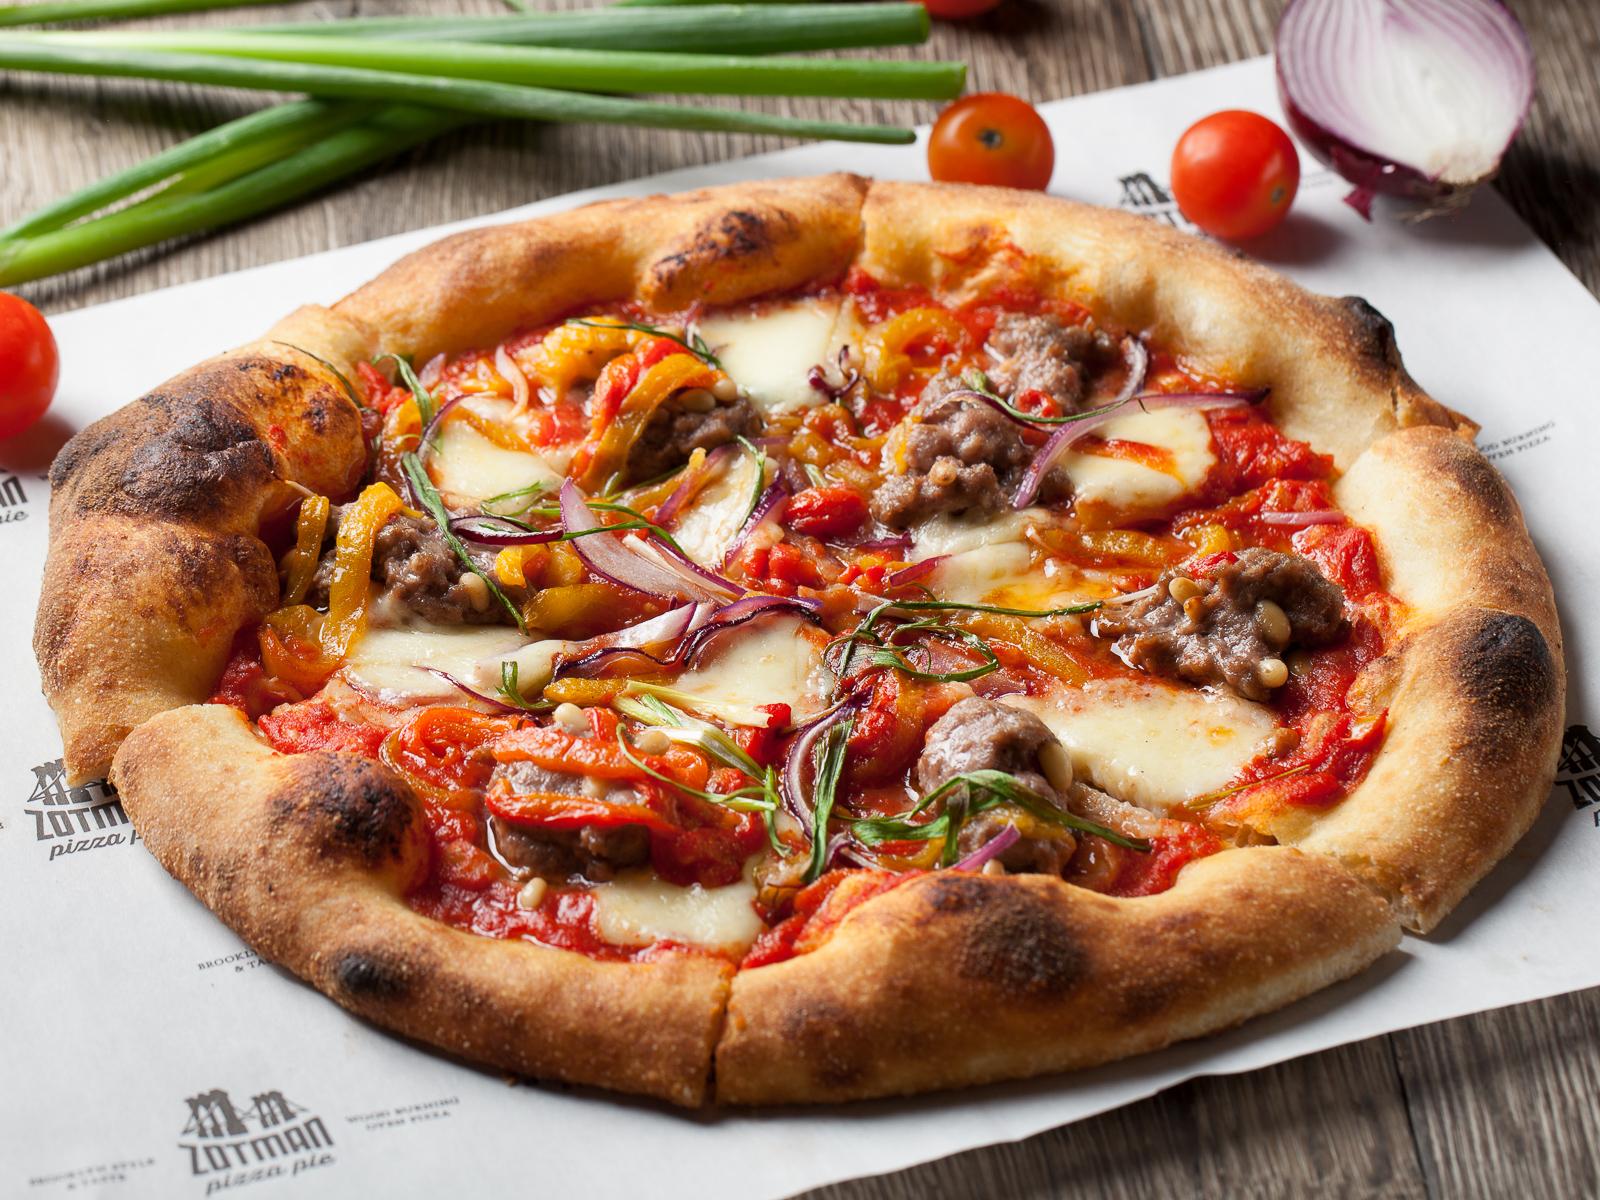 Пицца с кебабом из ягненка